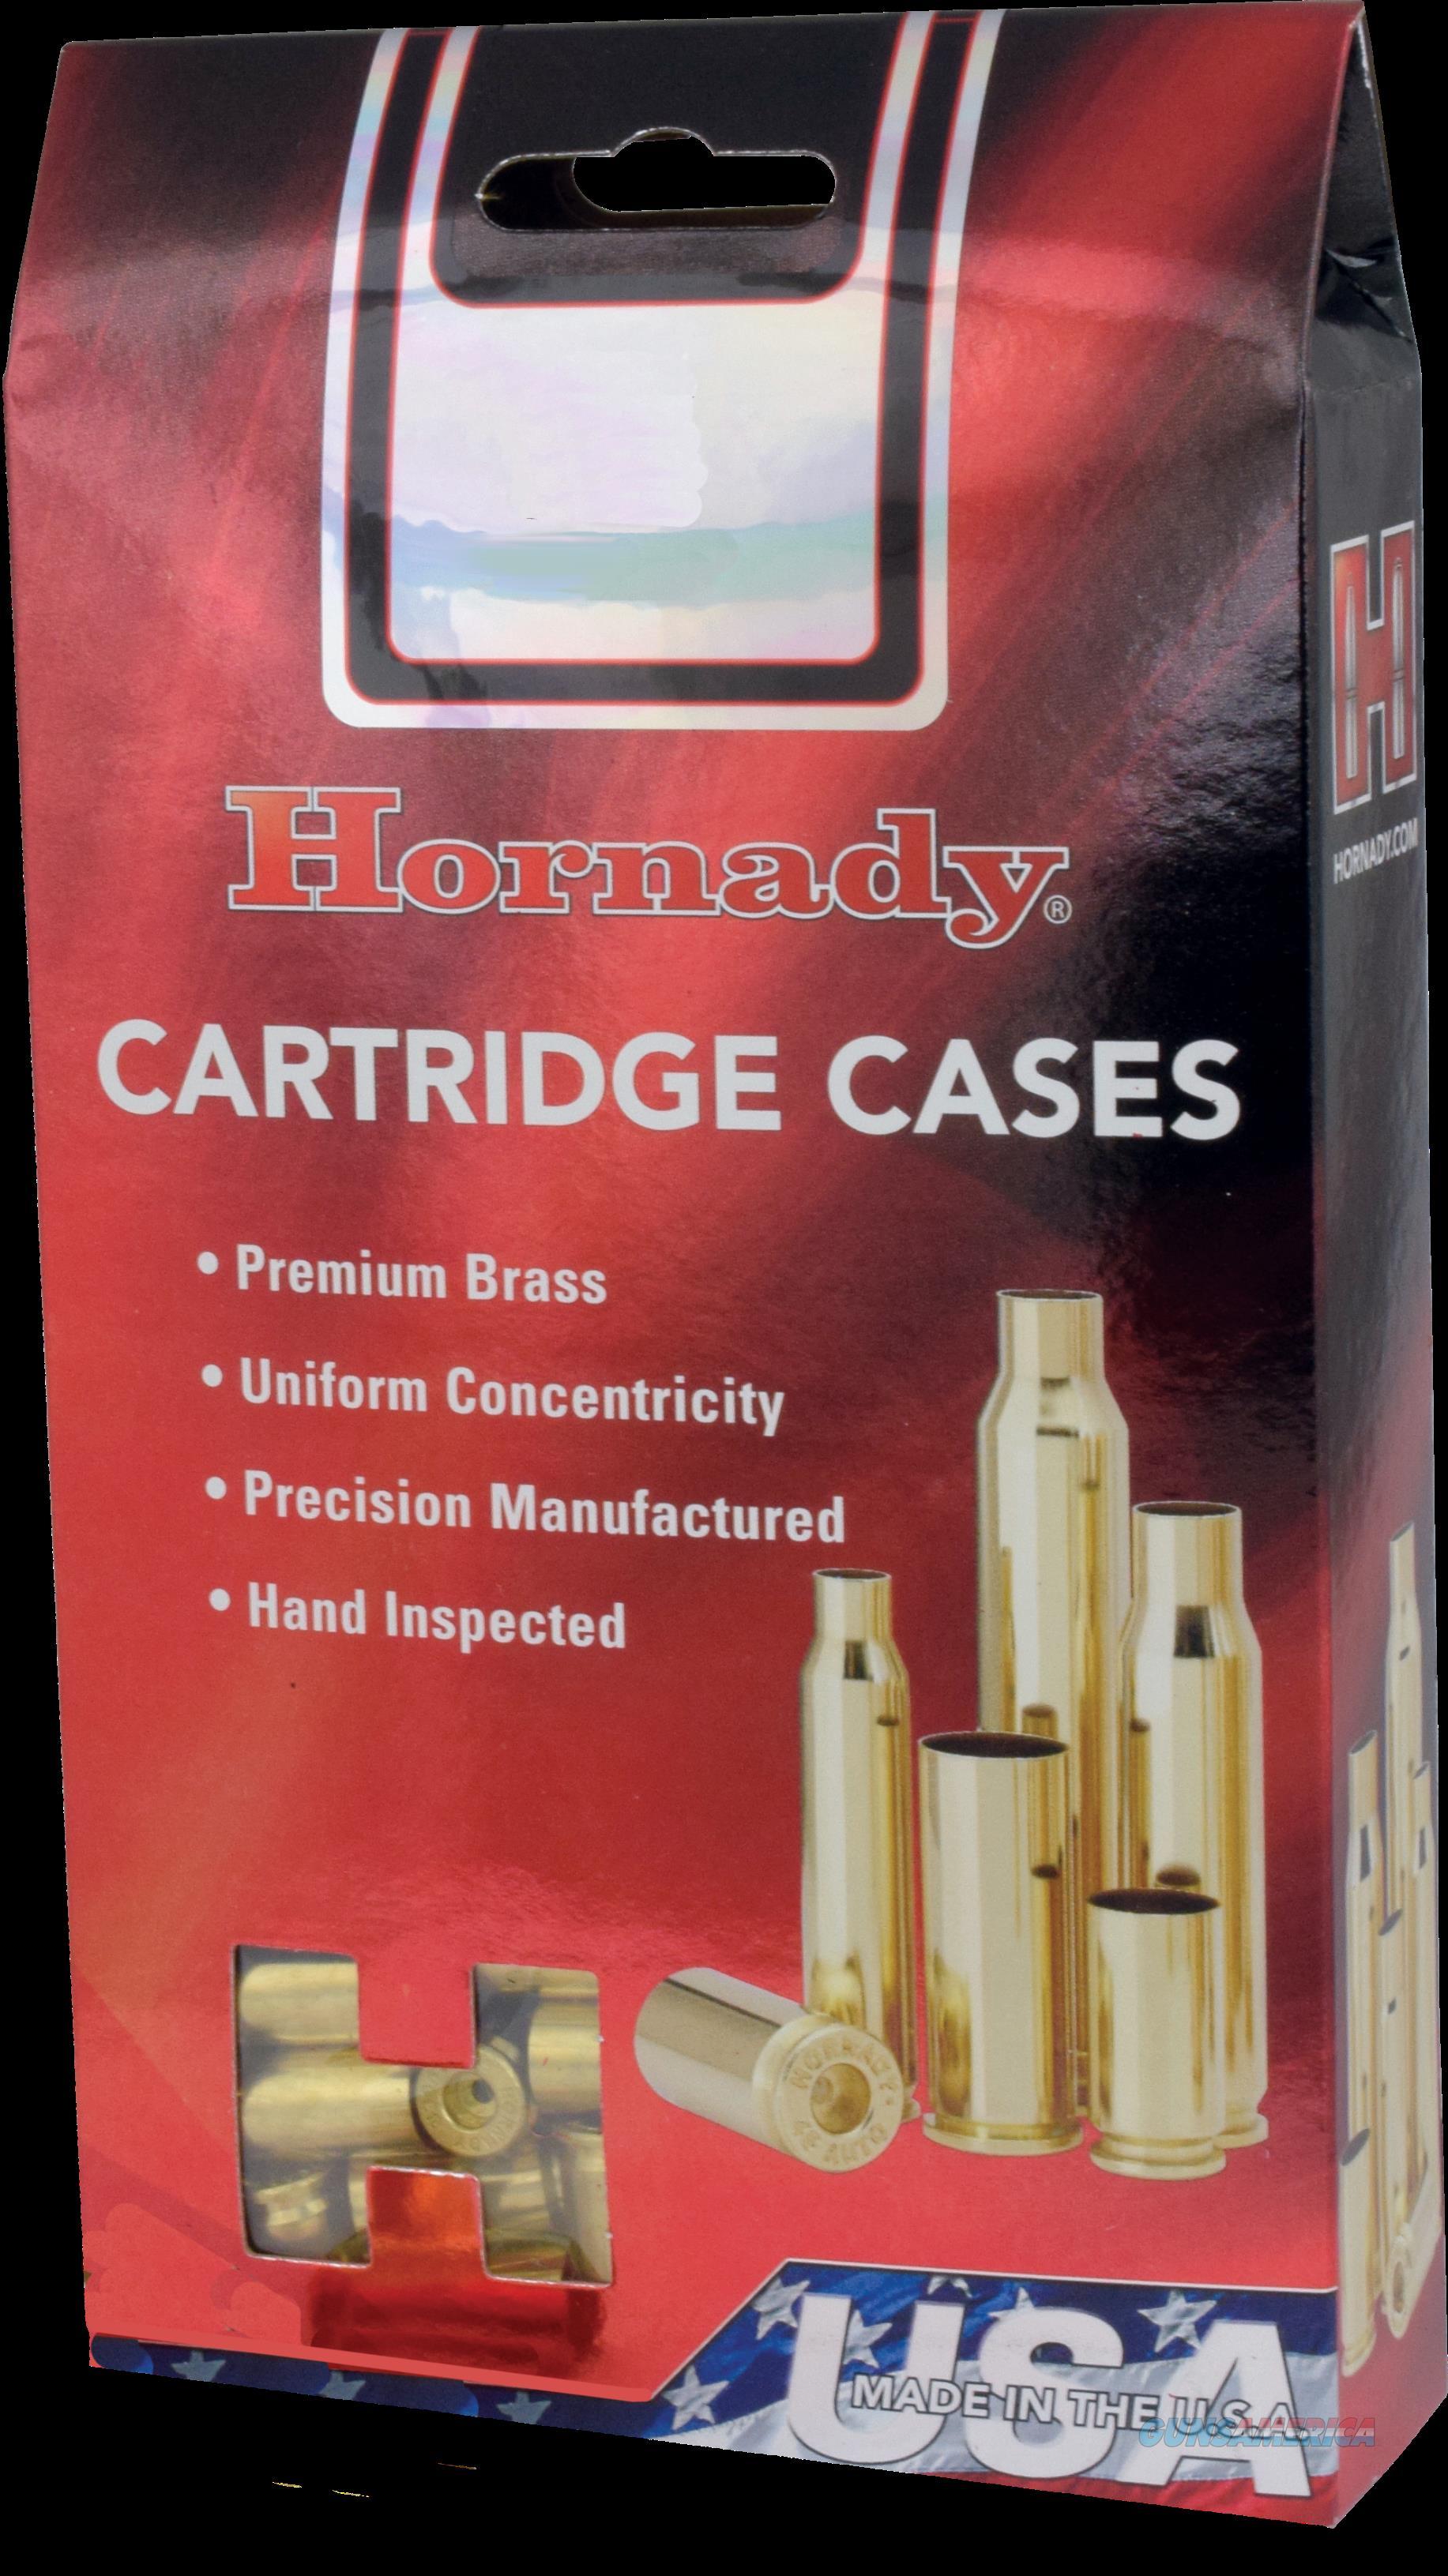 Hornady Savage, Horn 86105 Unp Case 250 Savage      50  Guns > Pistols > 1911 Pistol Copies (non-Colt)